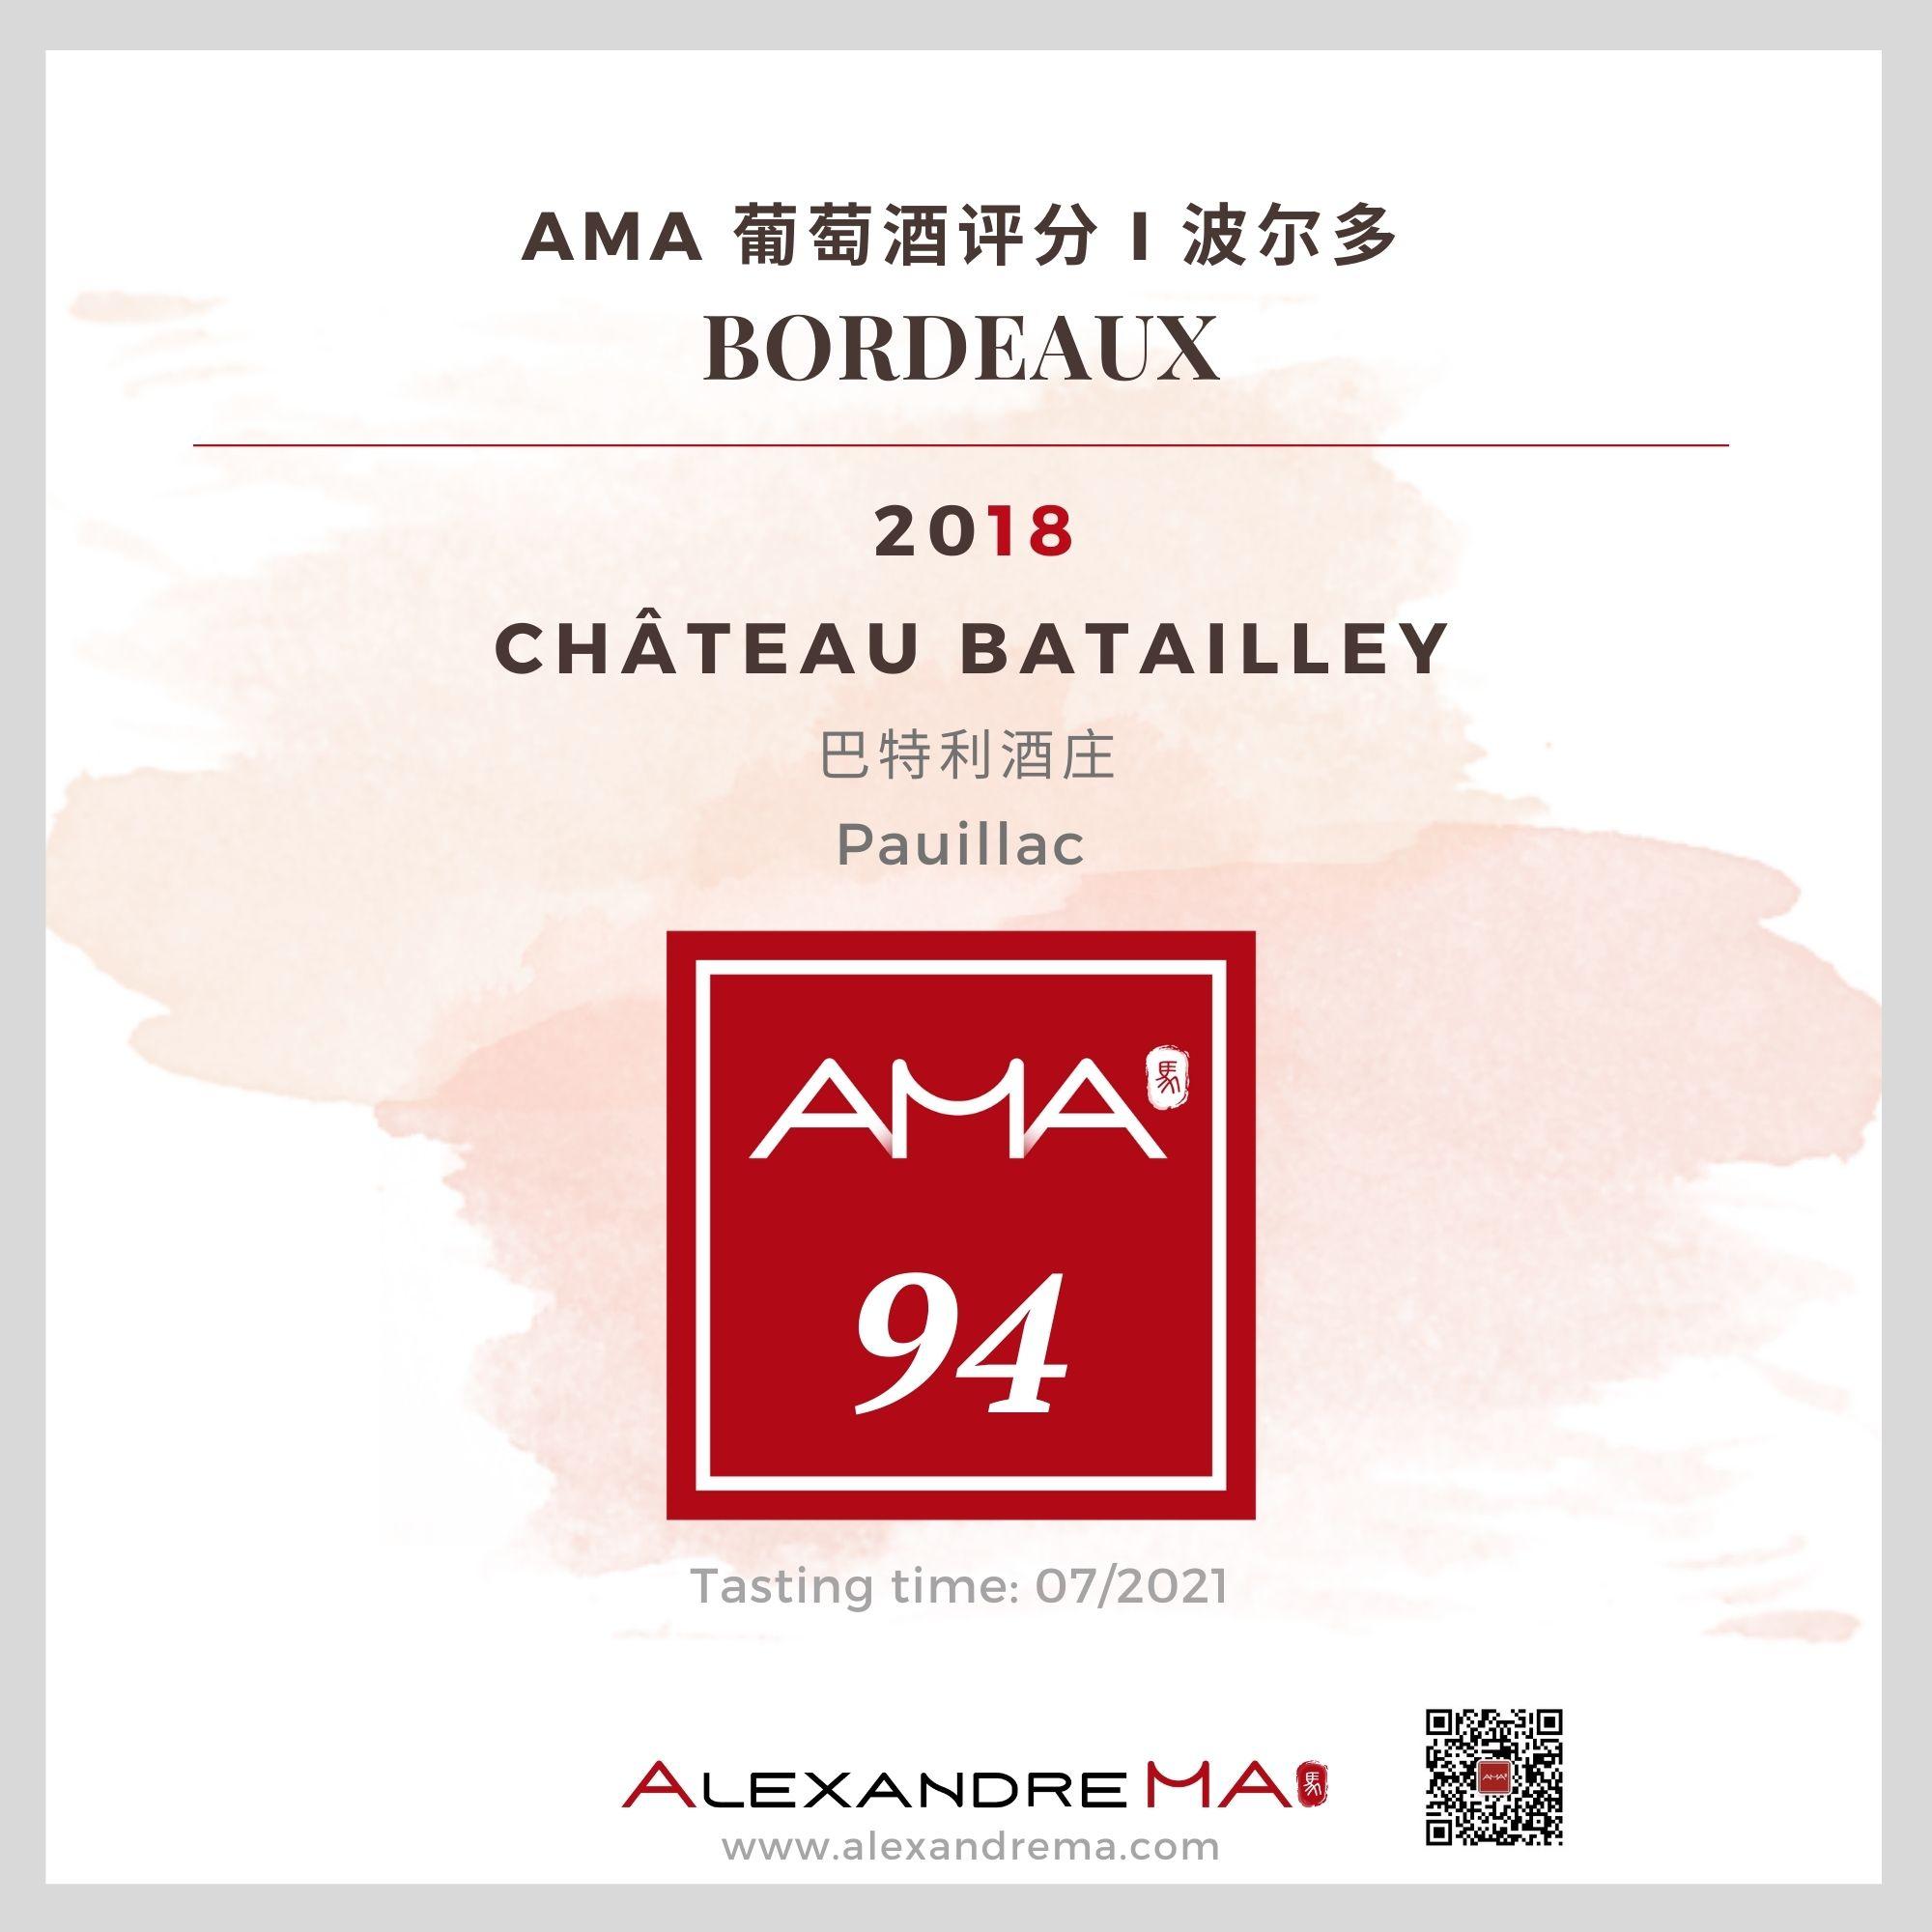 Château Batailley 2018 巴特利酒庄 - Alexandre Ma